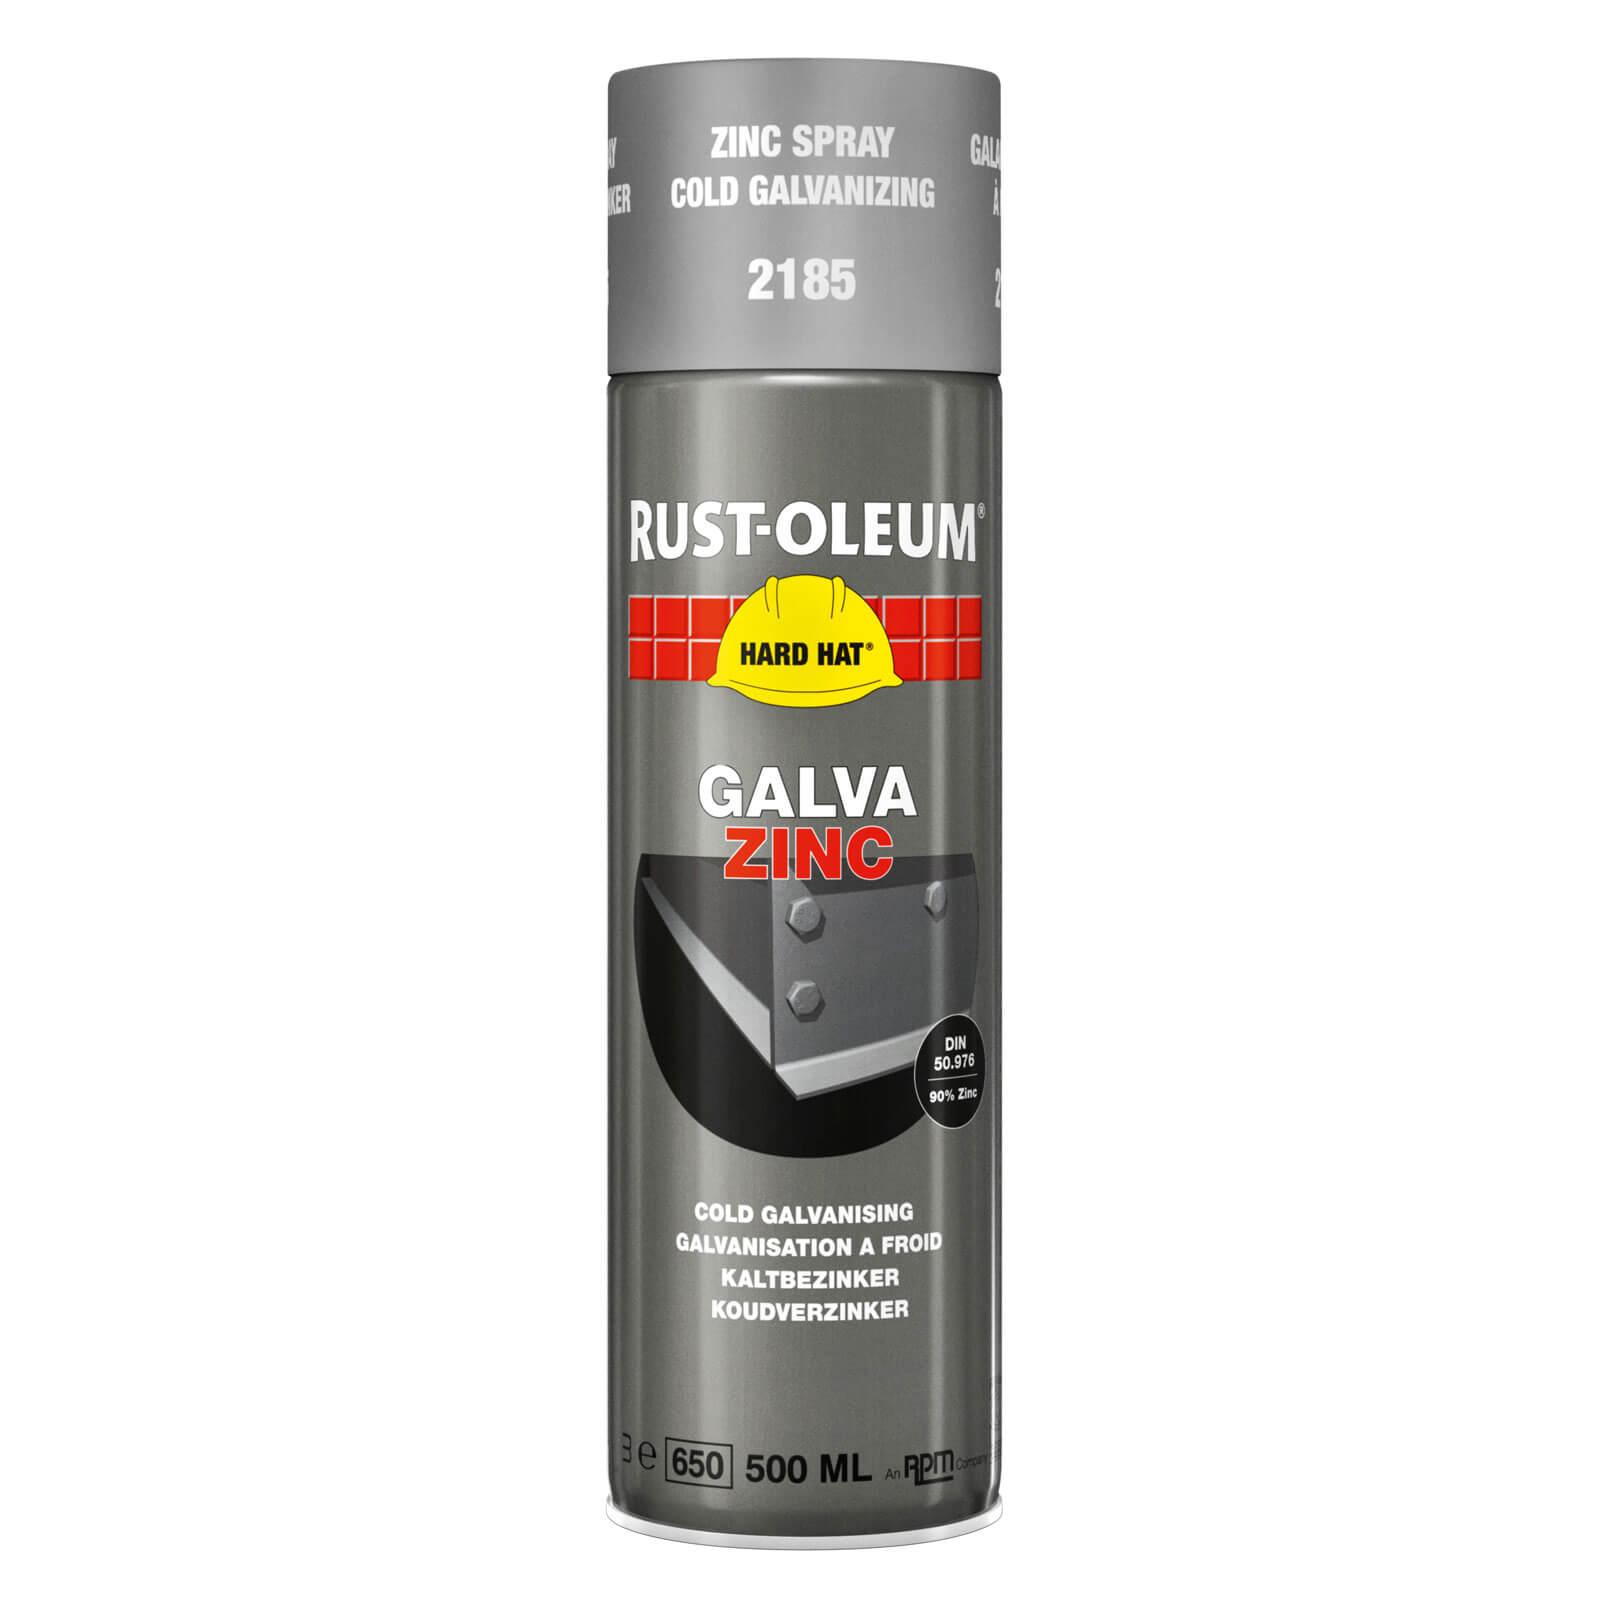 Image of Rust Oleum Hard Hat Galvanising Zinc Spray Paint Galv Express 500ml